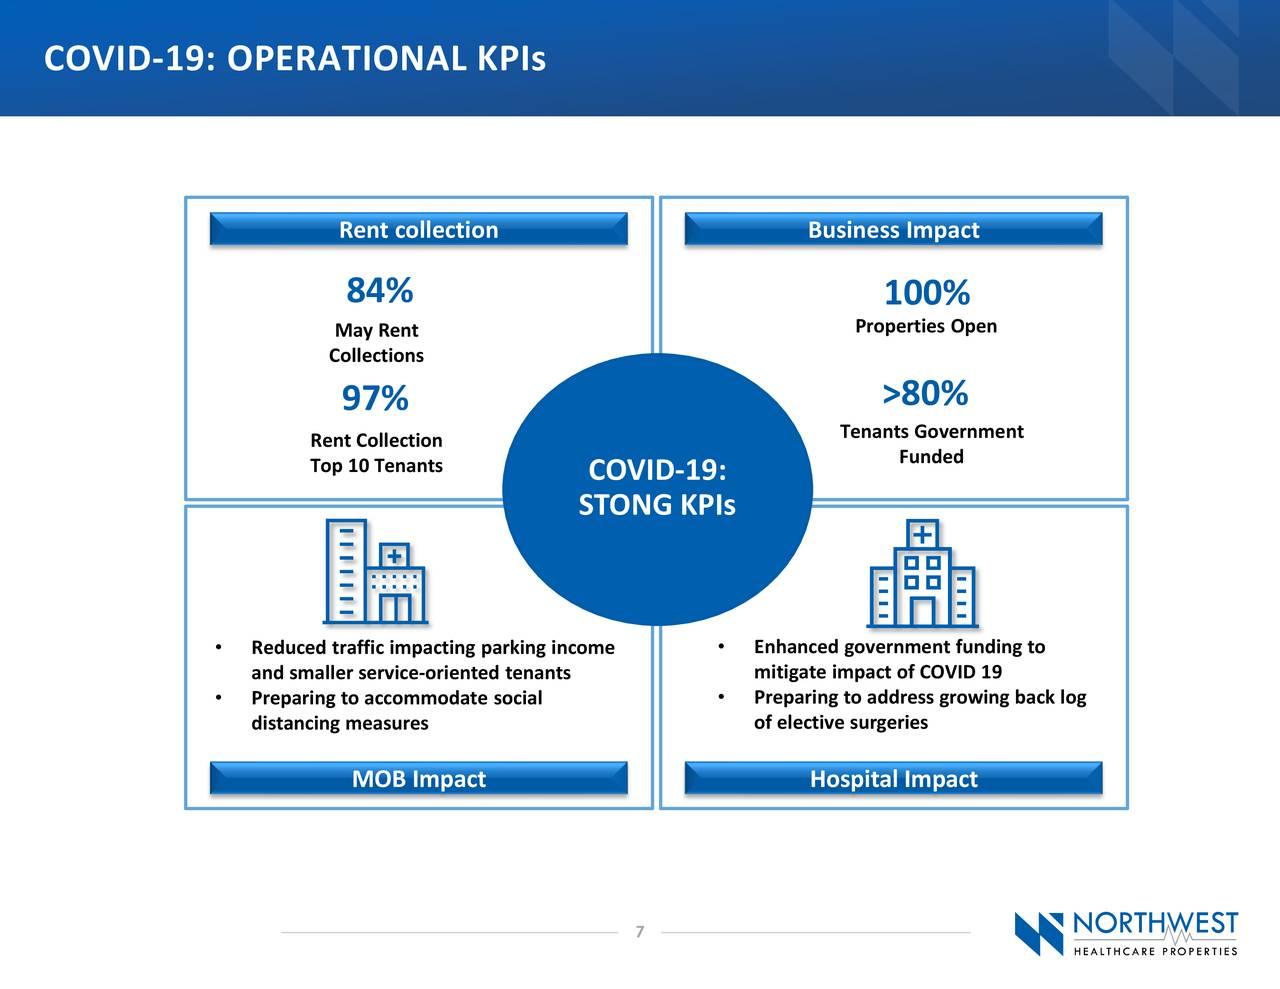 COVID-19: KPI OPERACIONALES